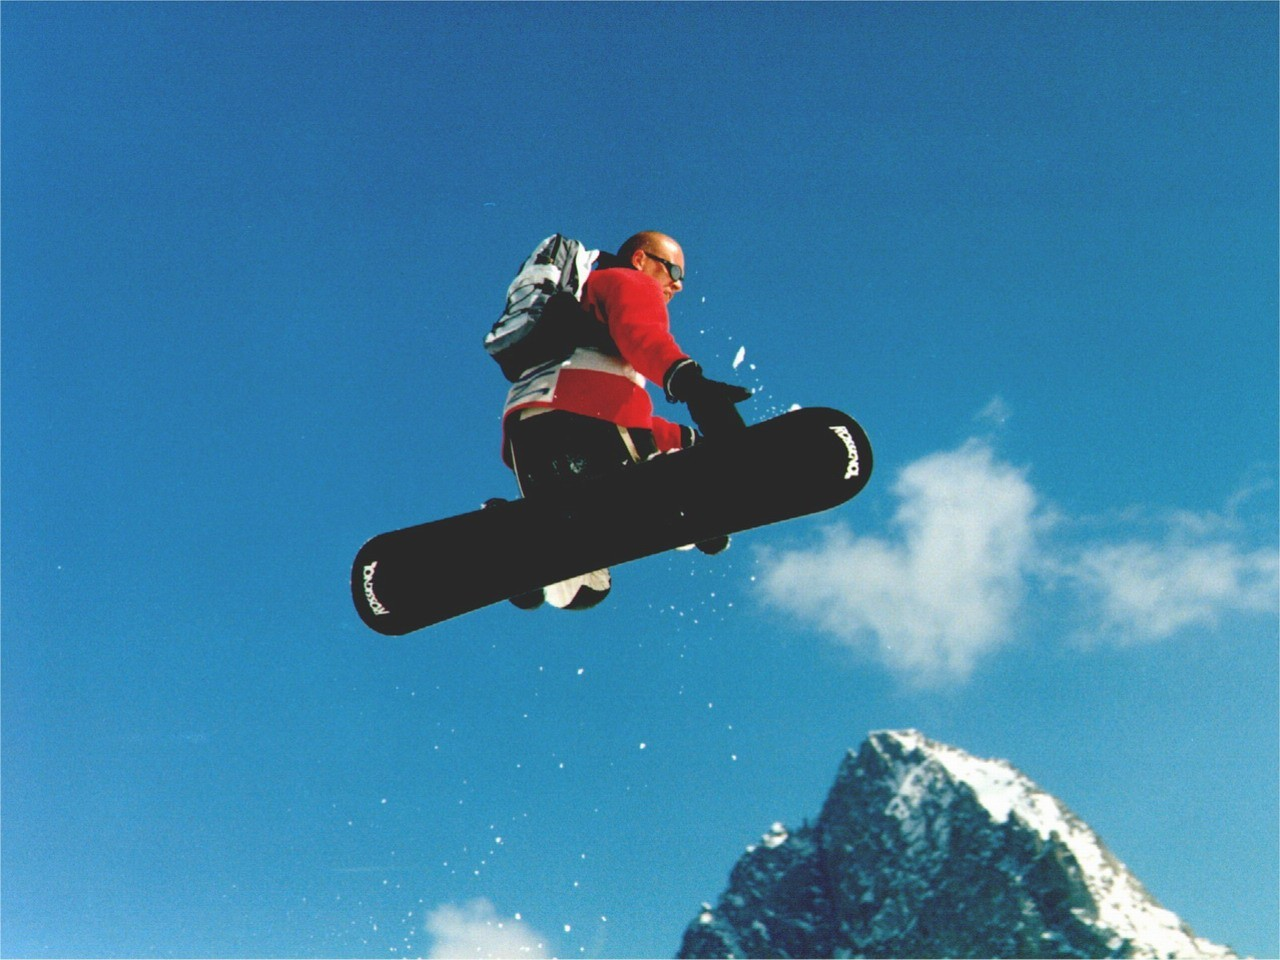 Snowboard Wallpaper Resolution1280x960 48views Image Size20132k 1280x960